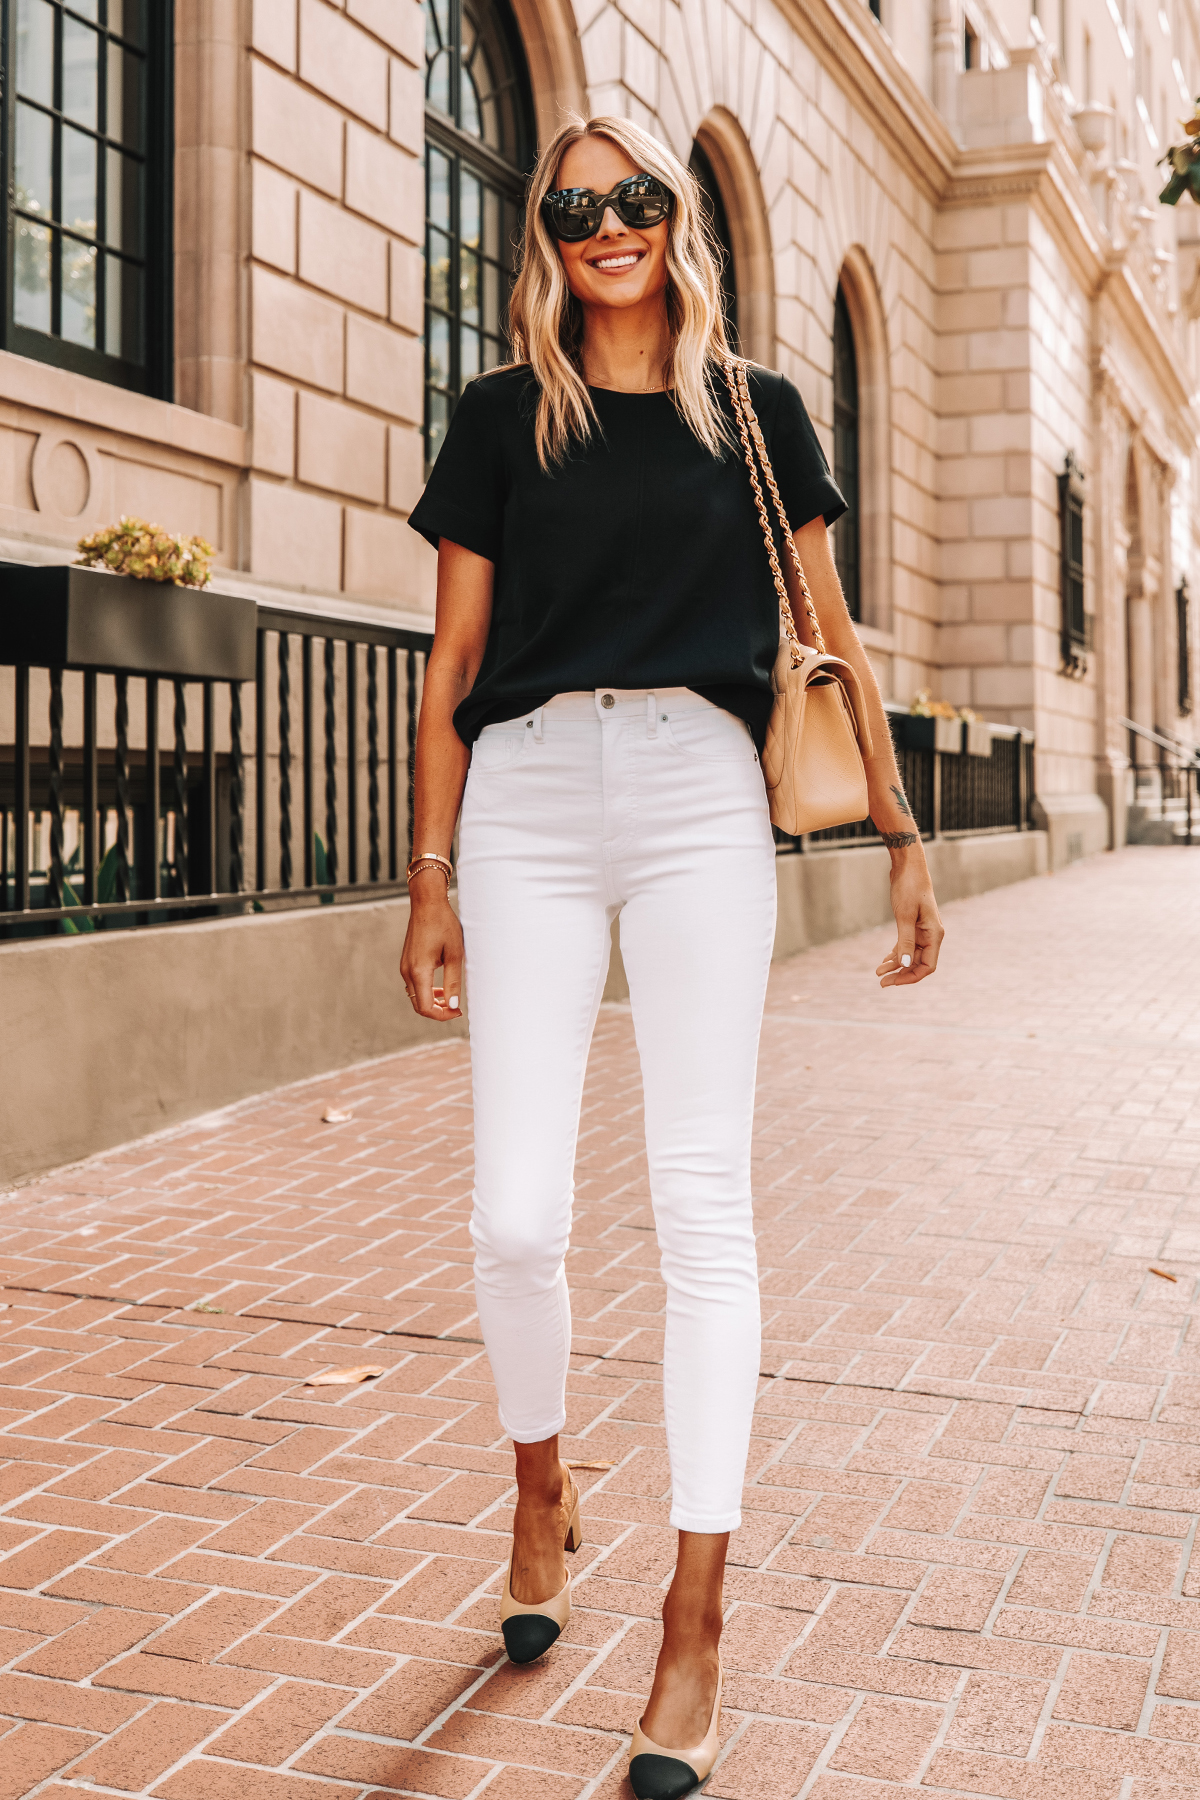 Fashion Jackson Wearing Everlane Black Short Sleeve Top Everlane White High Rise Skinny Jeans Chanel Slingbacks 1